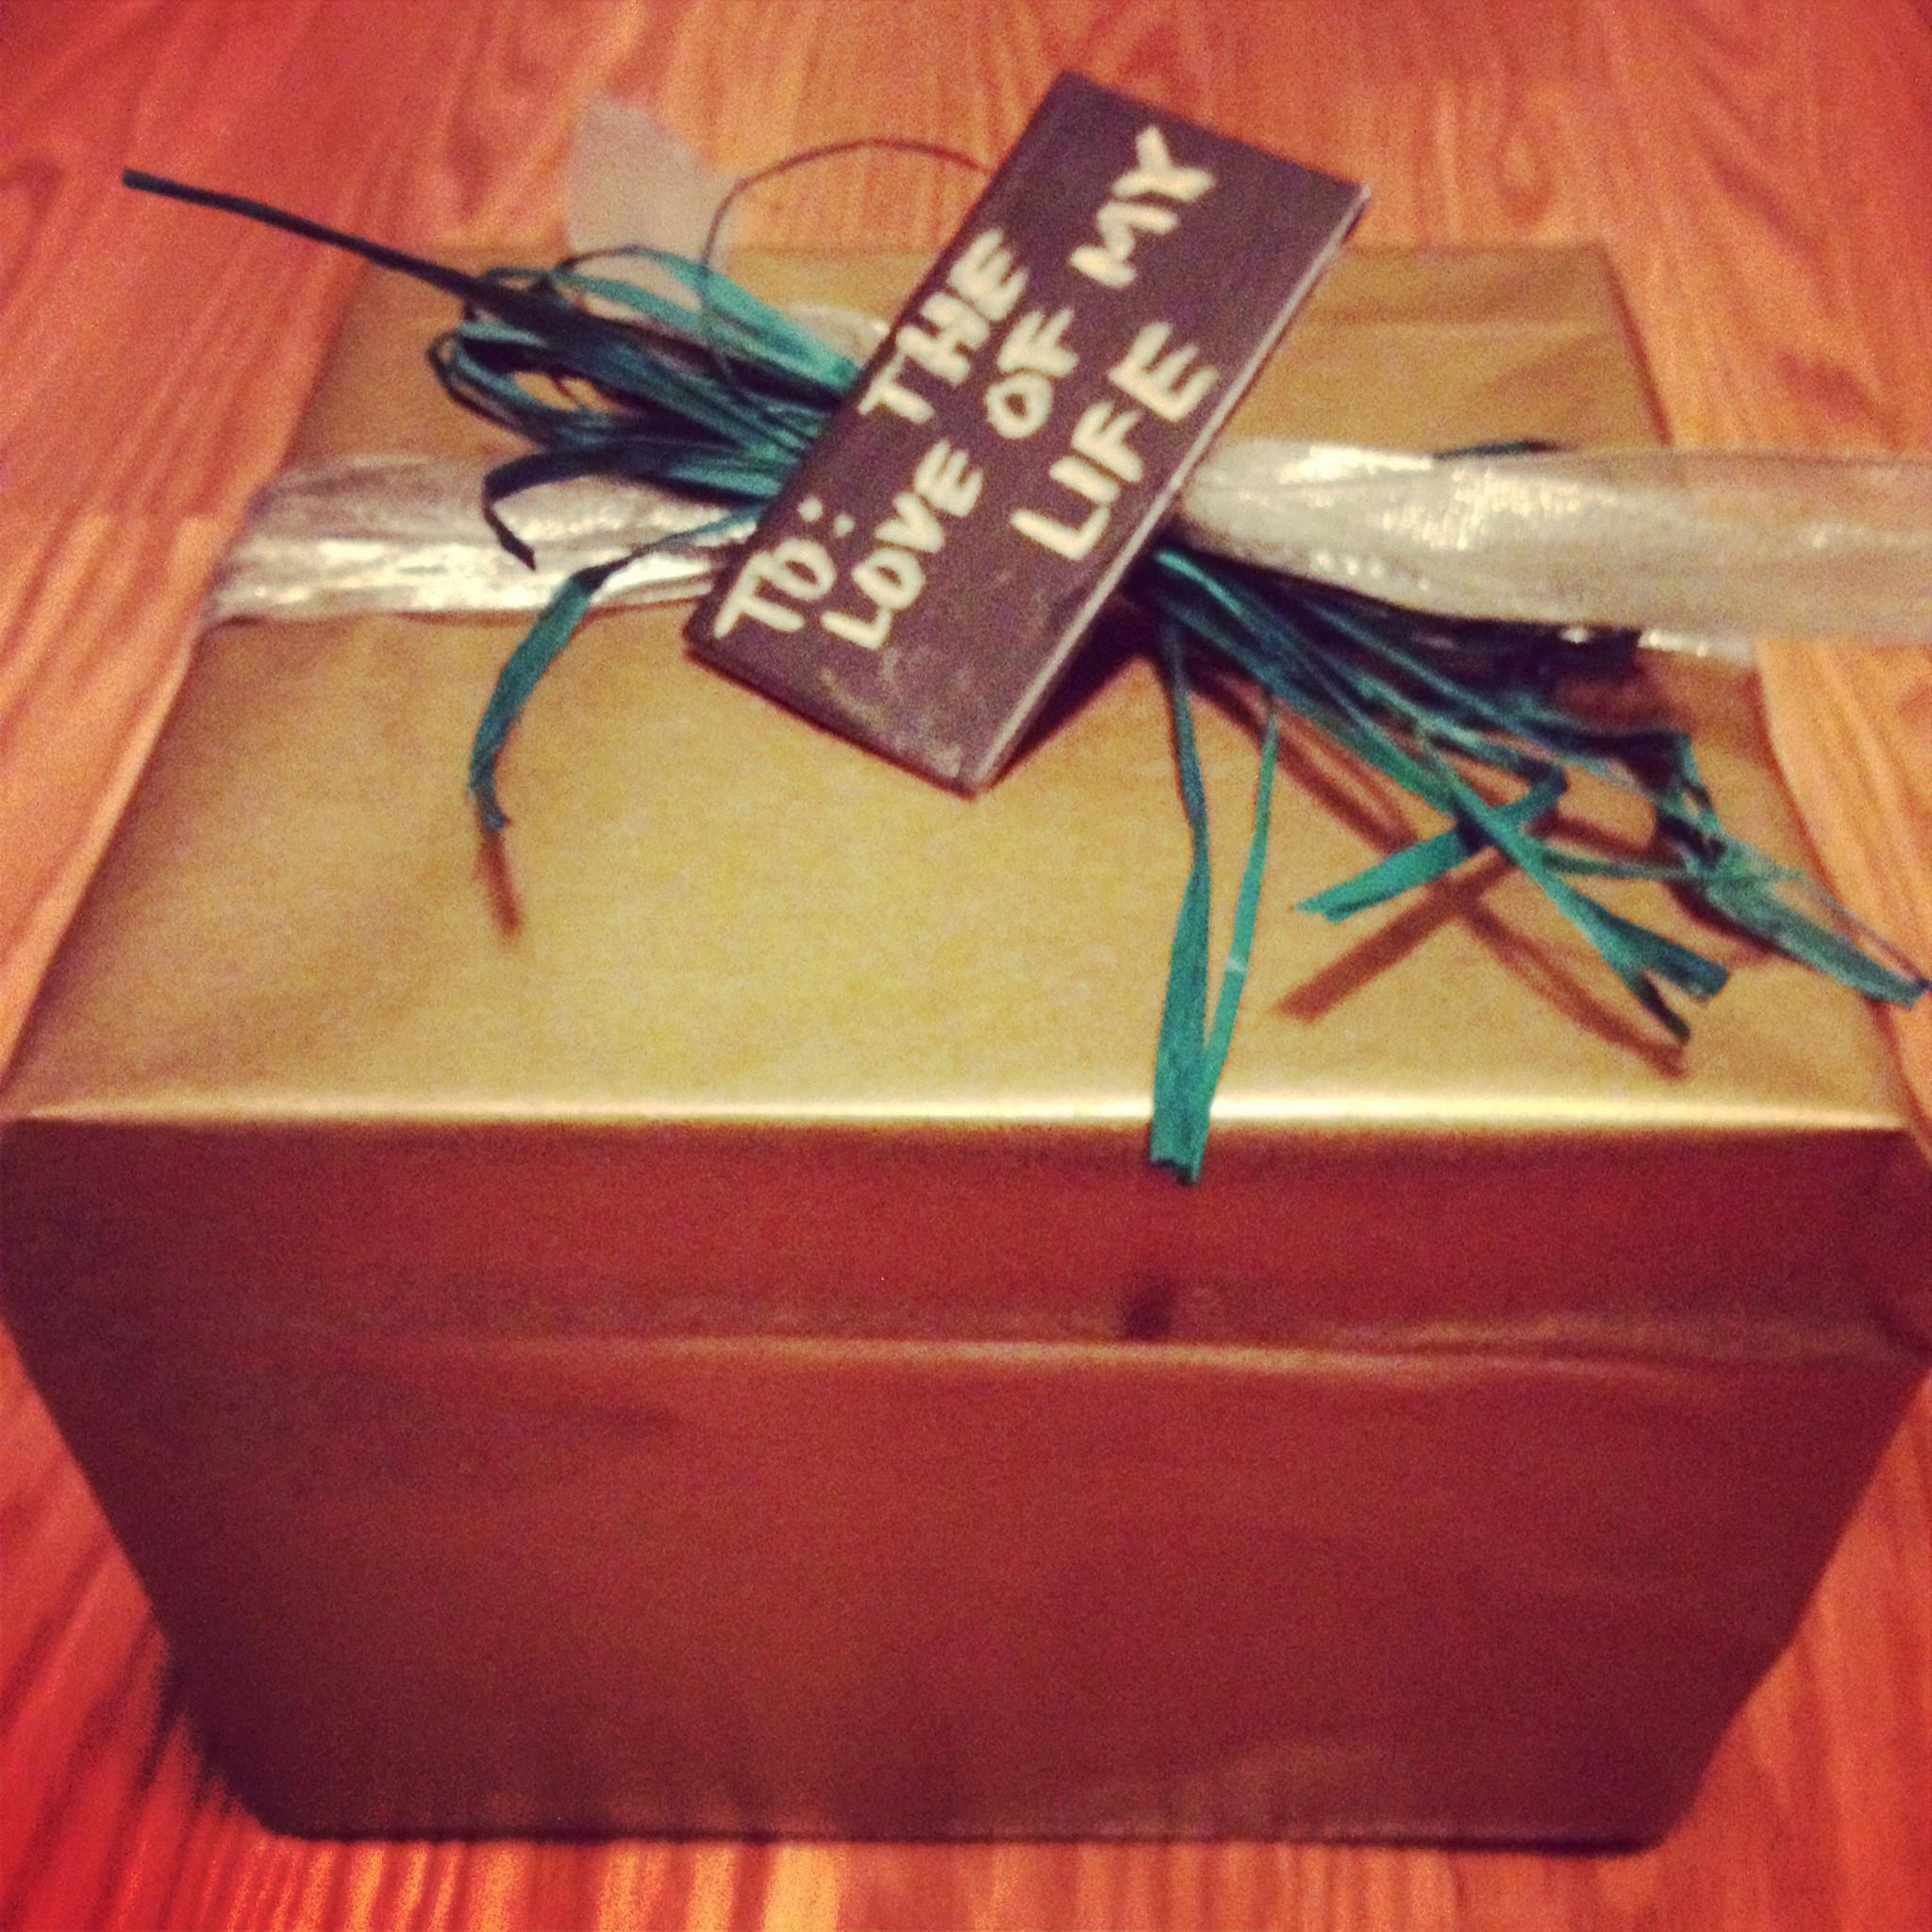 Best ideas about Unique Birthday Gift Ideas . Save or Pin Unique DIY Birthday Gift Idea Now.